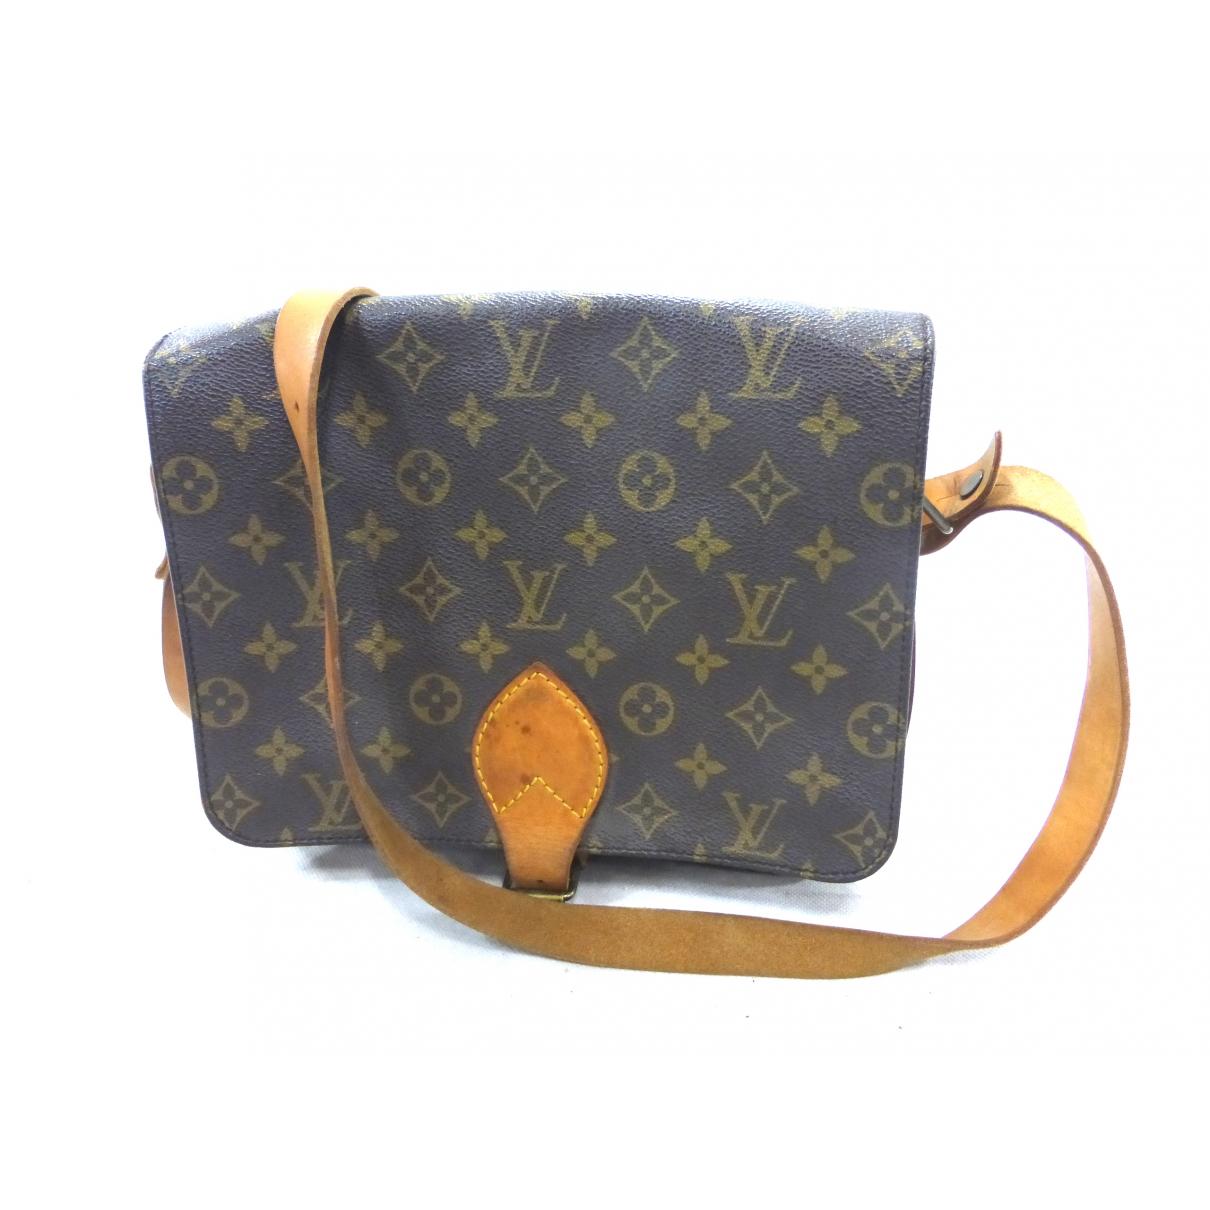 Louis Vuitton Cartouchière Brown Cloth handbag for Women \N